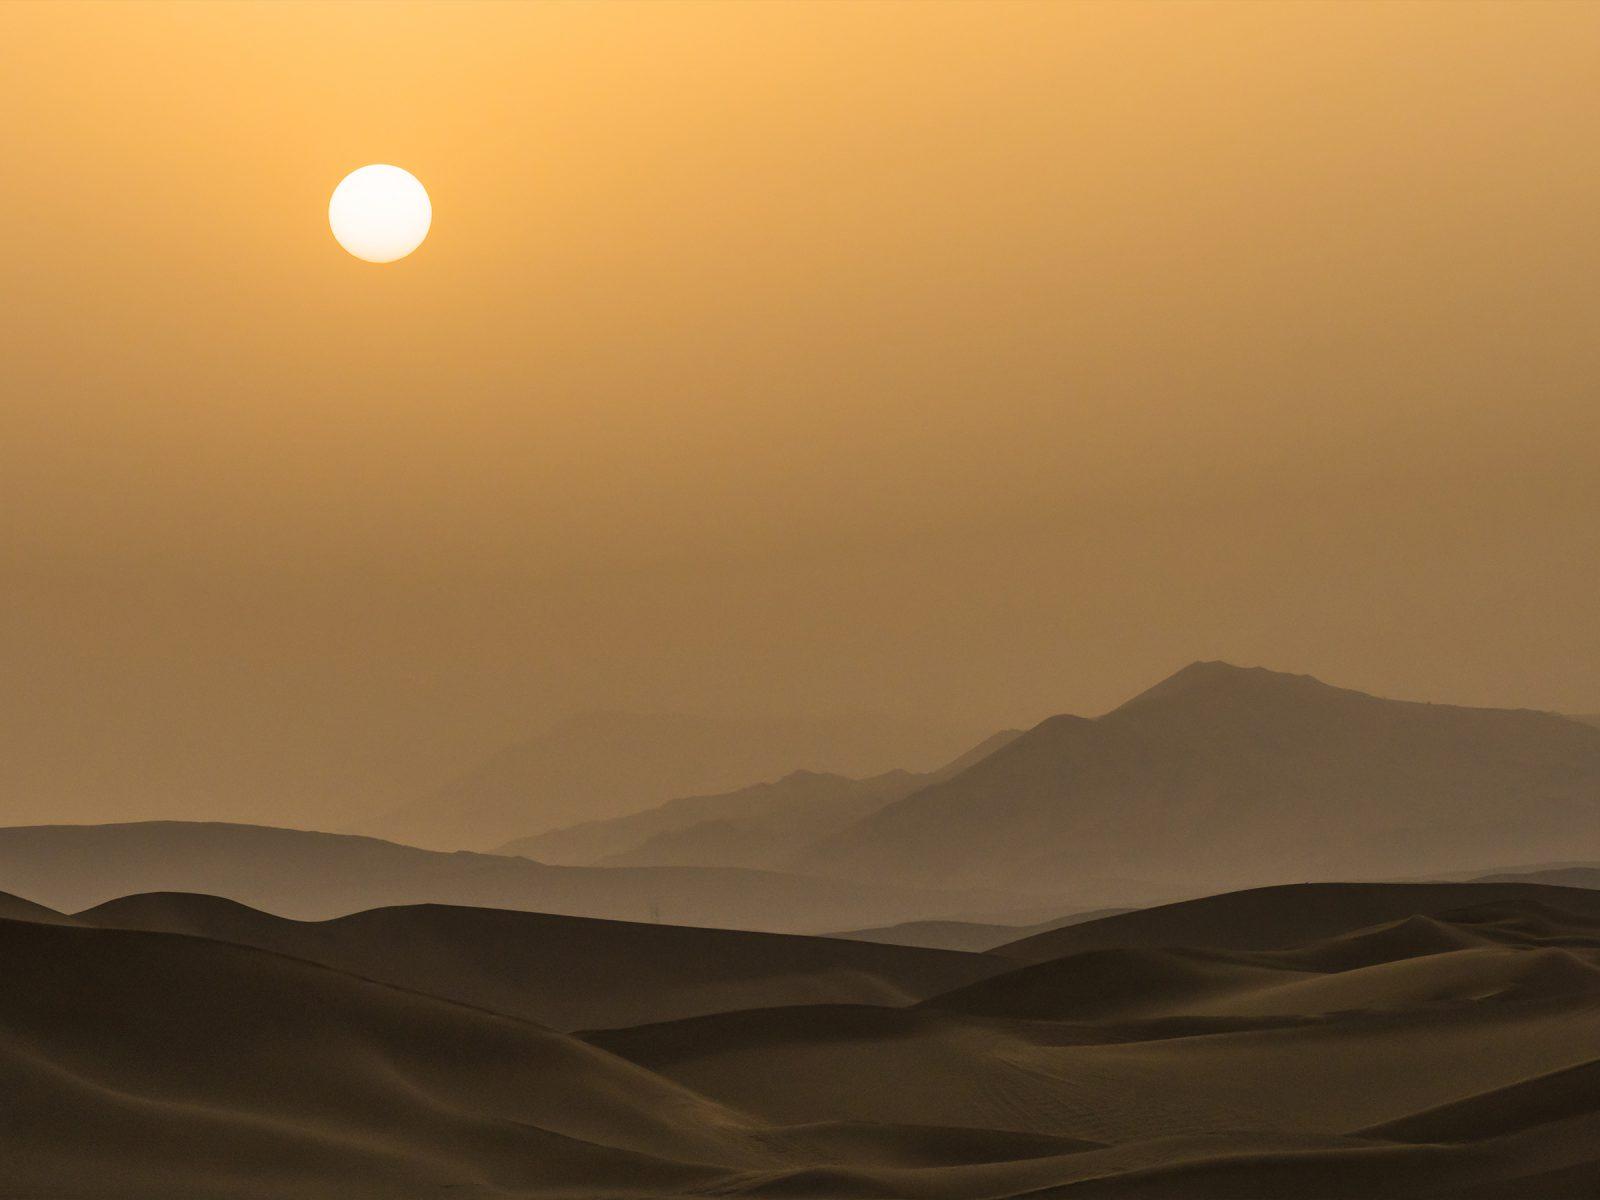 Silhouette of sunset on the desert in Xinjiang Uygur Autonomous Region, China. Photograph © iStock.com/Centuryboy.